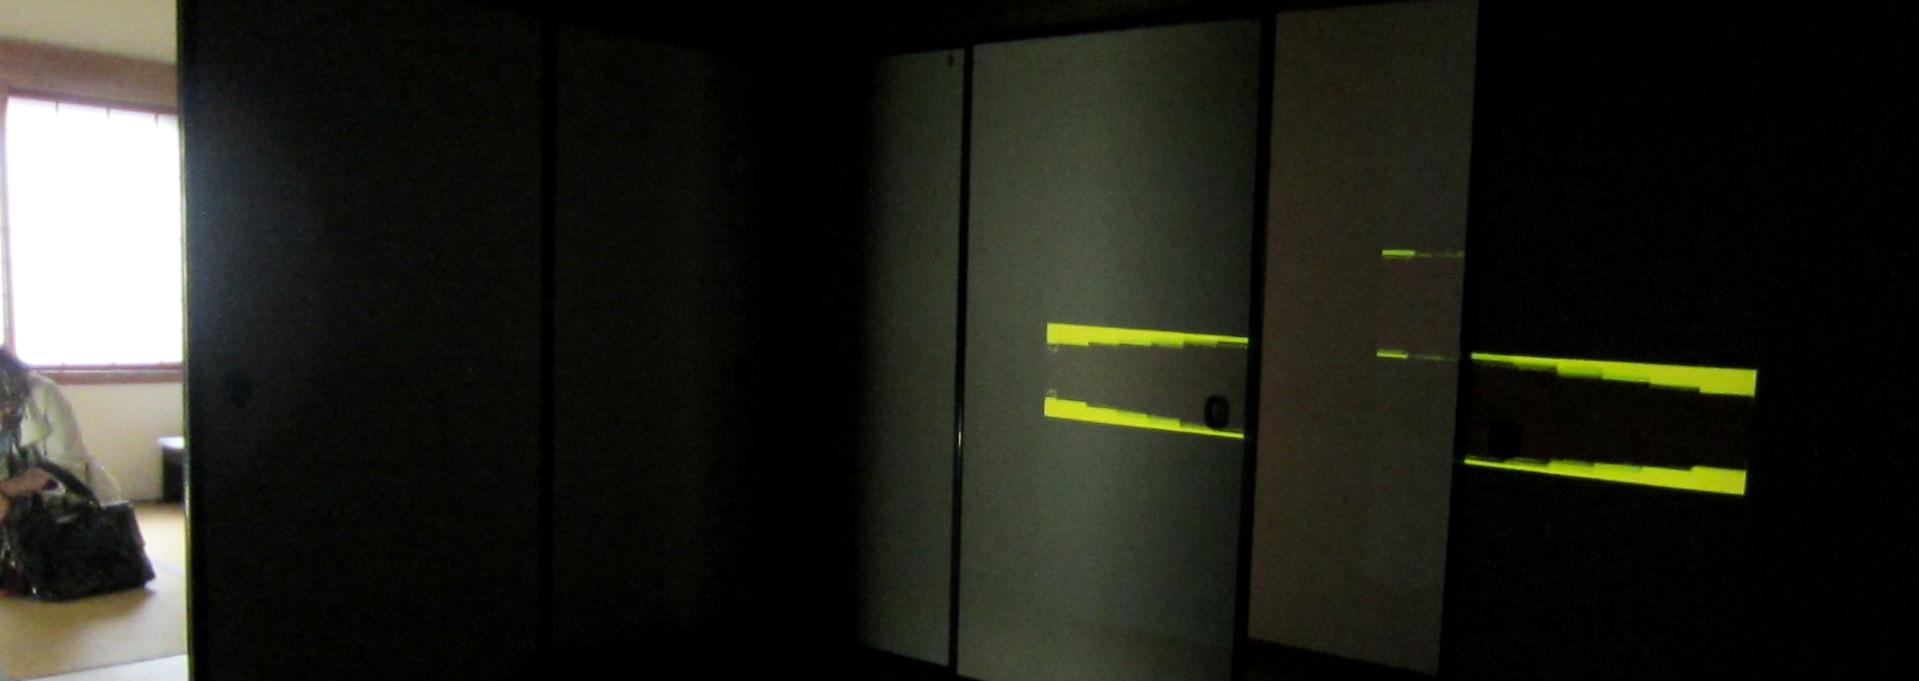 2035)「上野麗市 個展 『De\'tente デタント』」 g.犬養 4月17日(水)~4月29日(月)_f0126829_10413258.jpg